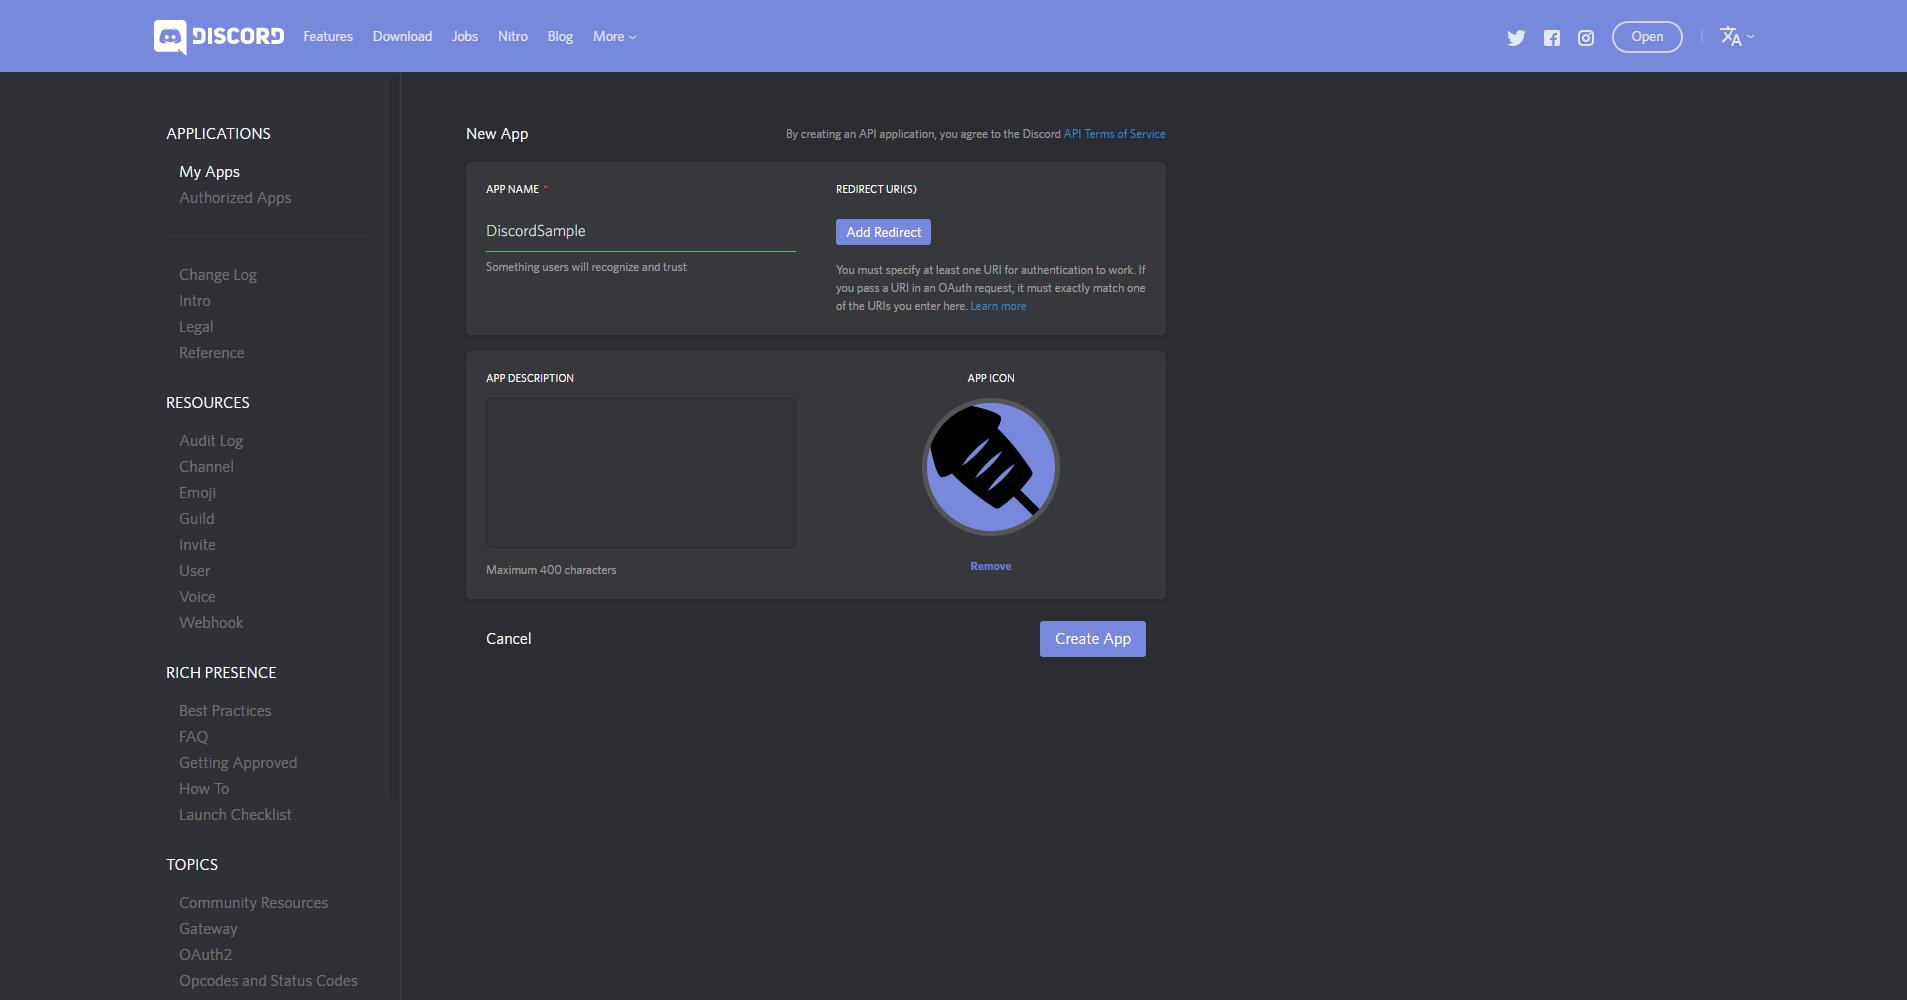 FireShot Capture 22 - Discord - Develope_ - https___discordapp.com_developers_applications_me_create.png